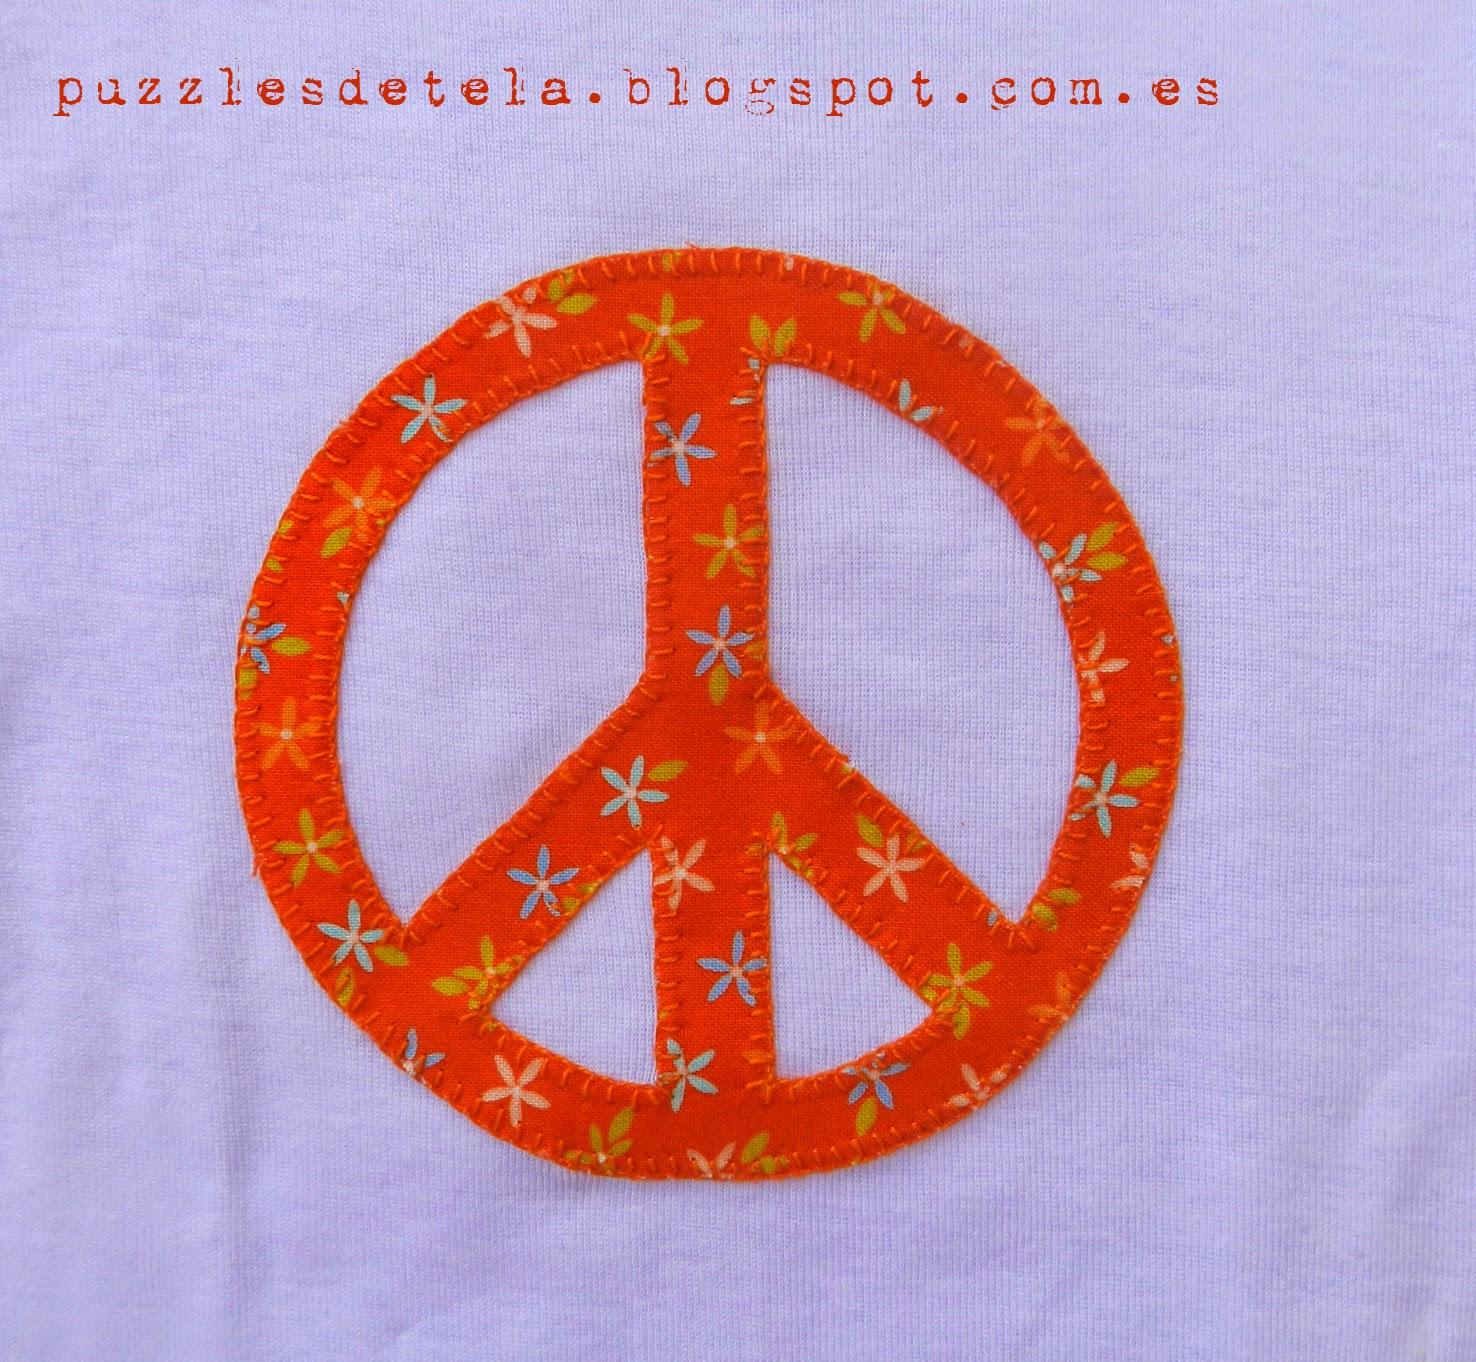 Vintage, Peace, Paz, patchwork, camiseta patchwork, Puzzles de tela, camiseta peace, camiseta Vintage, camiseta patchwork niña, aplicaciones patchwork